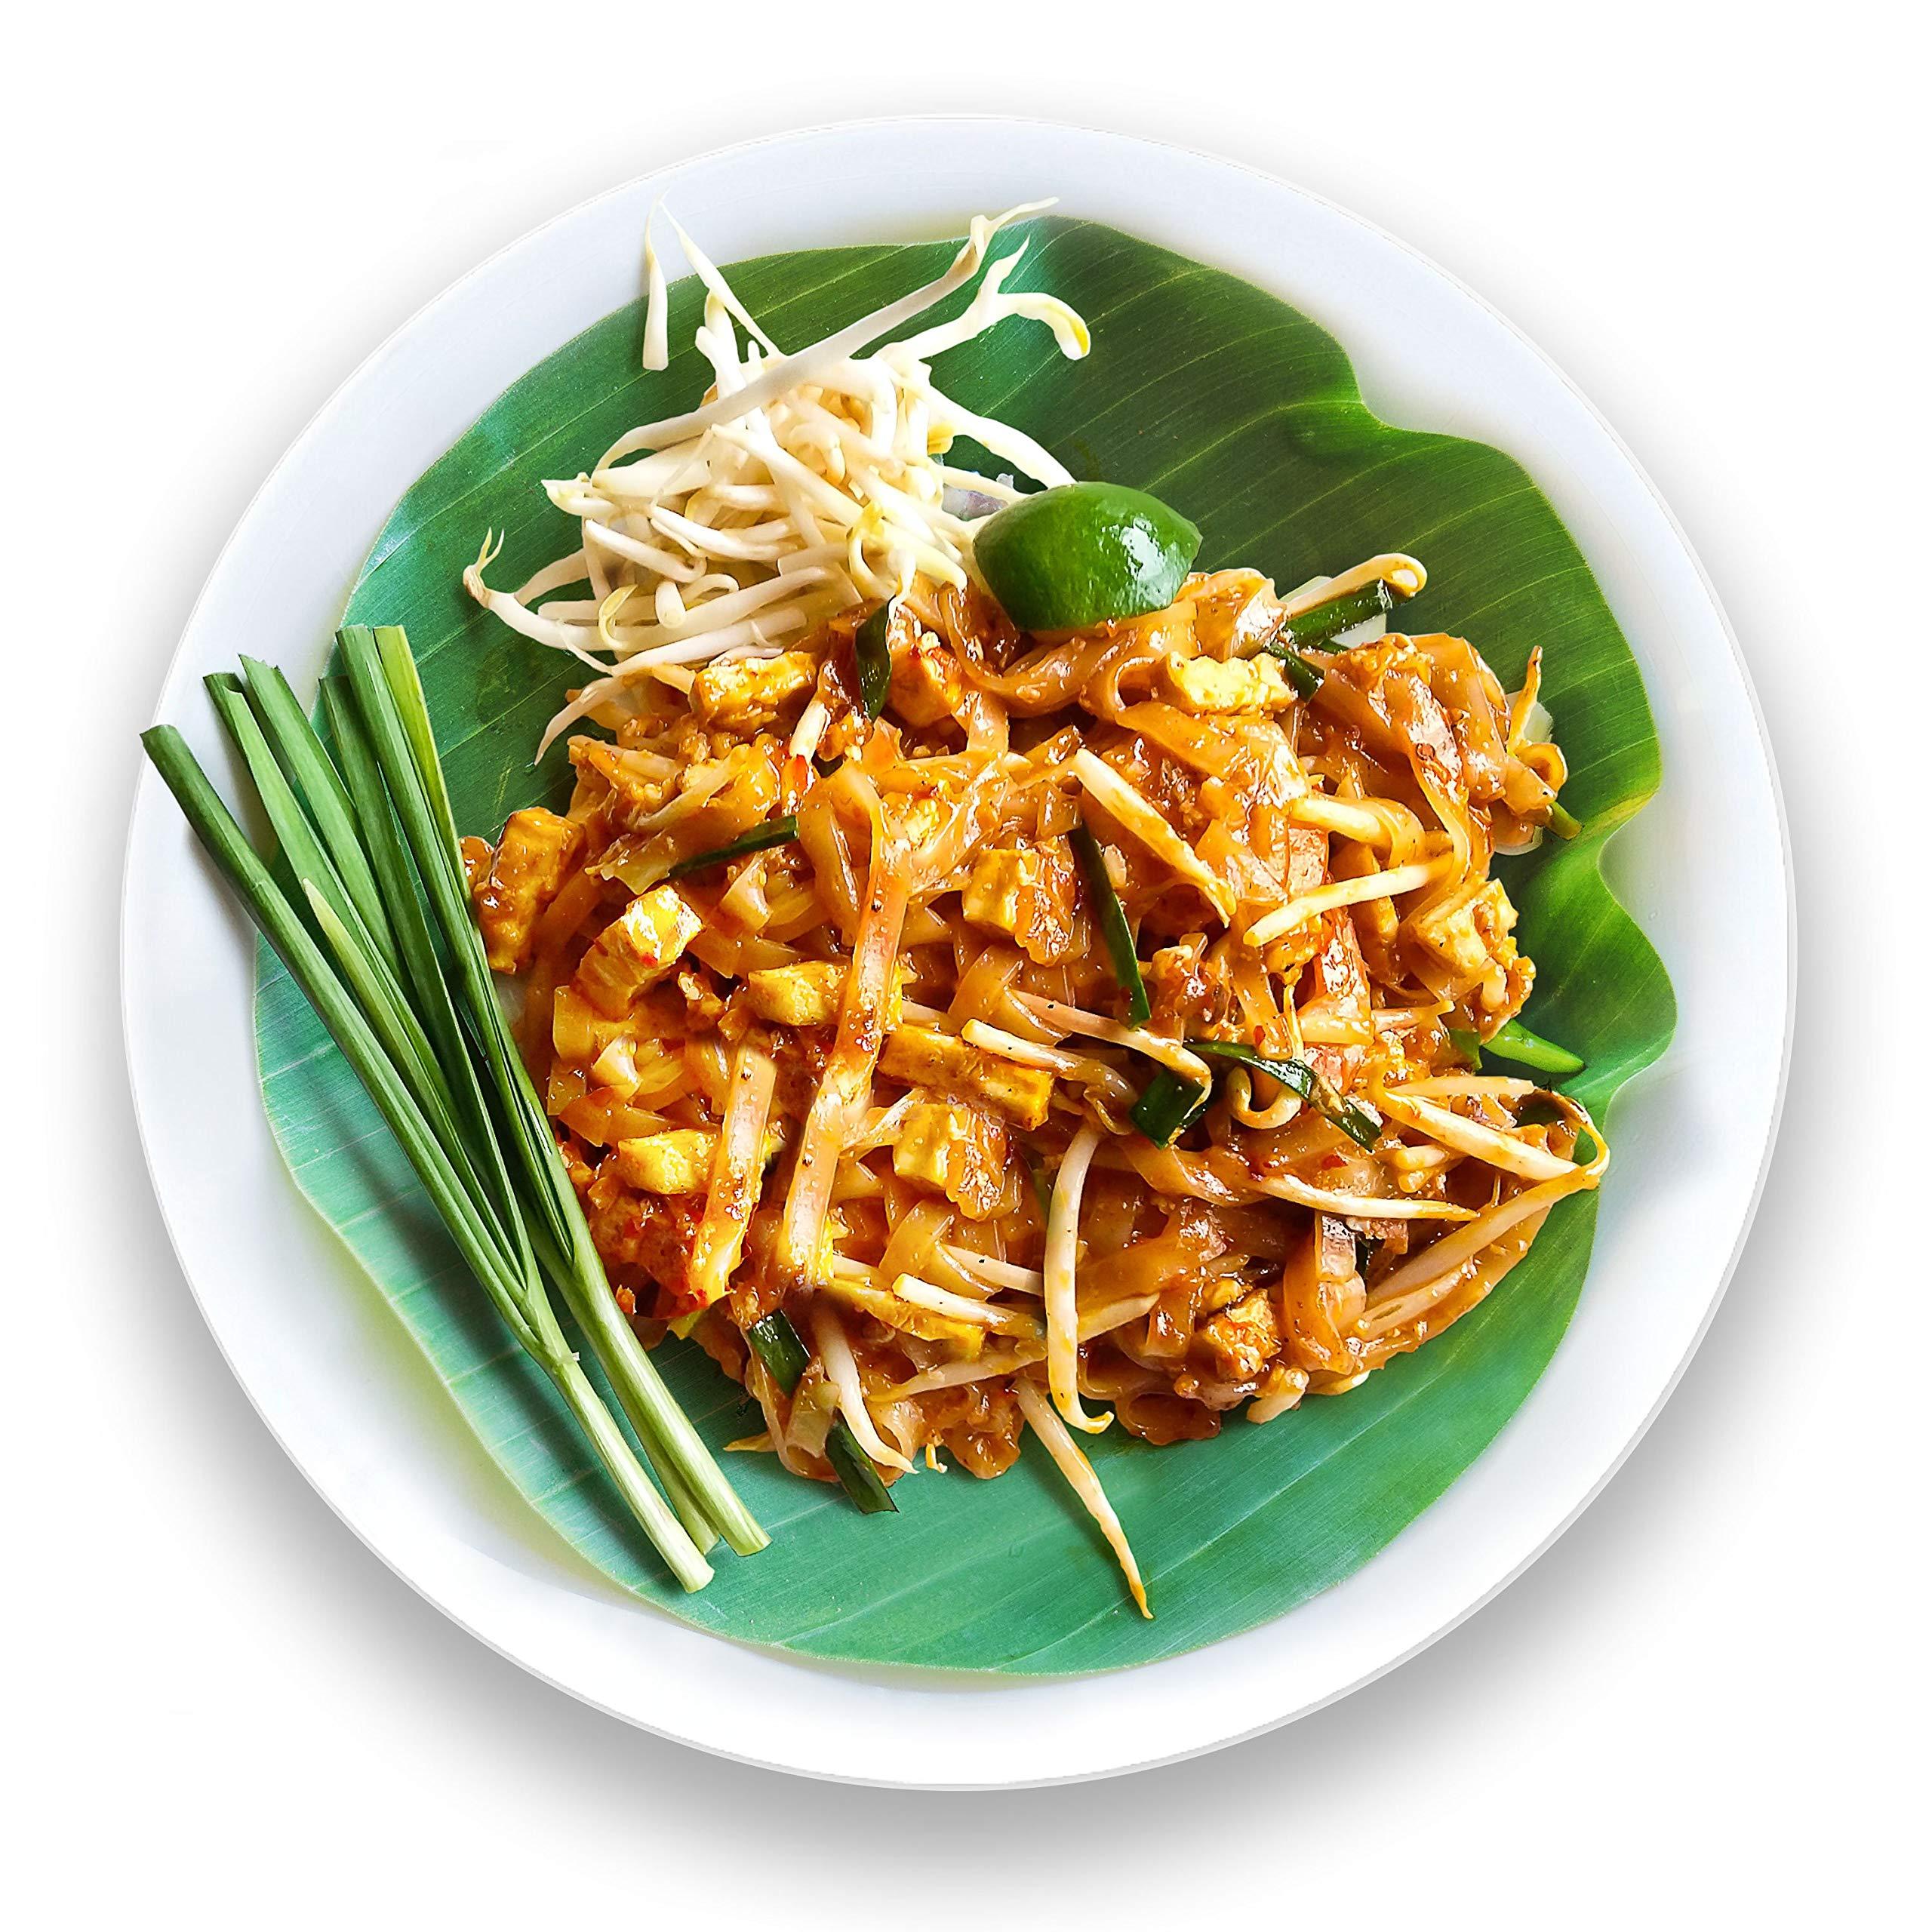 Takeout Kit, Pad Thai Meal Kit, Serves 4